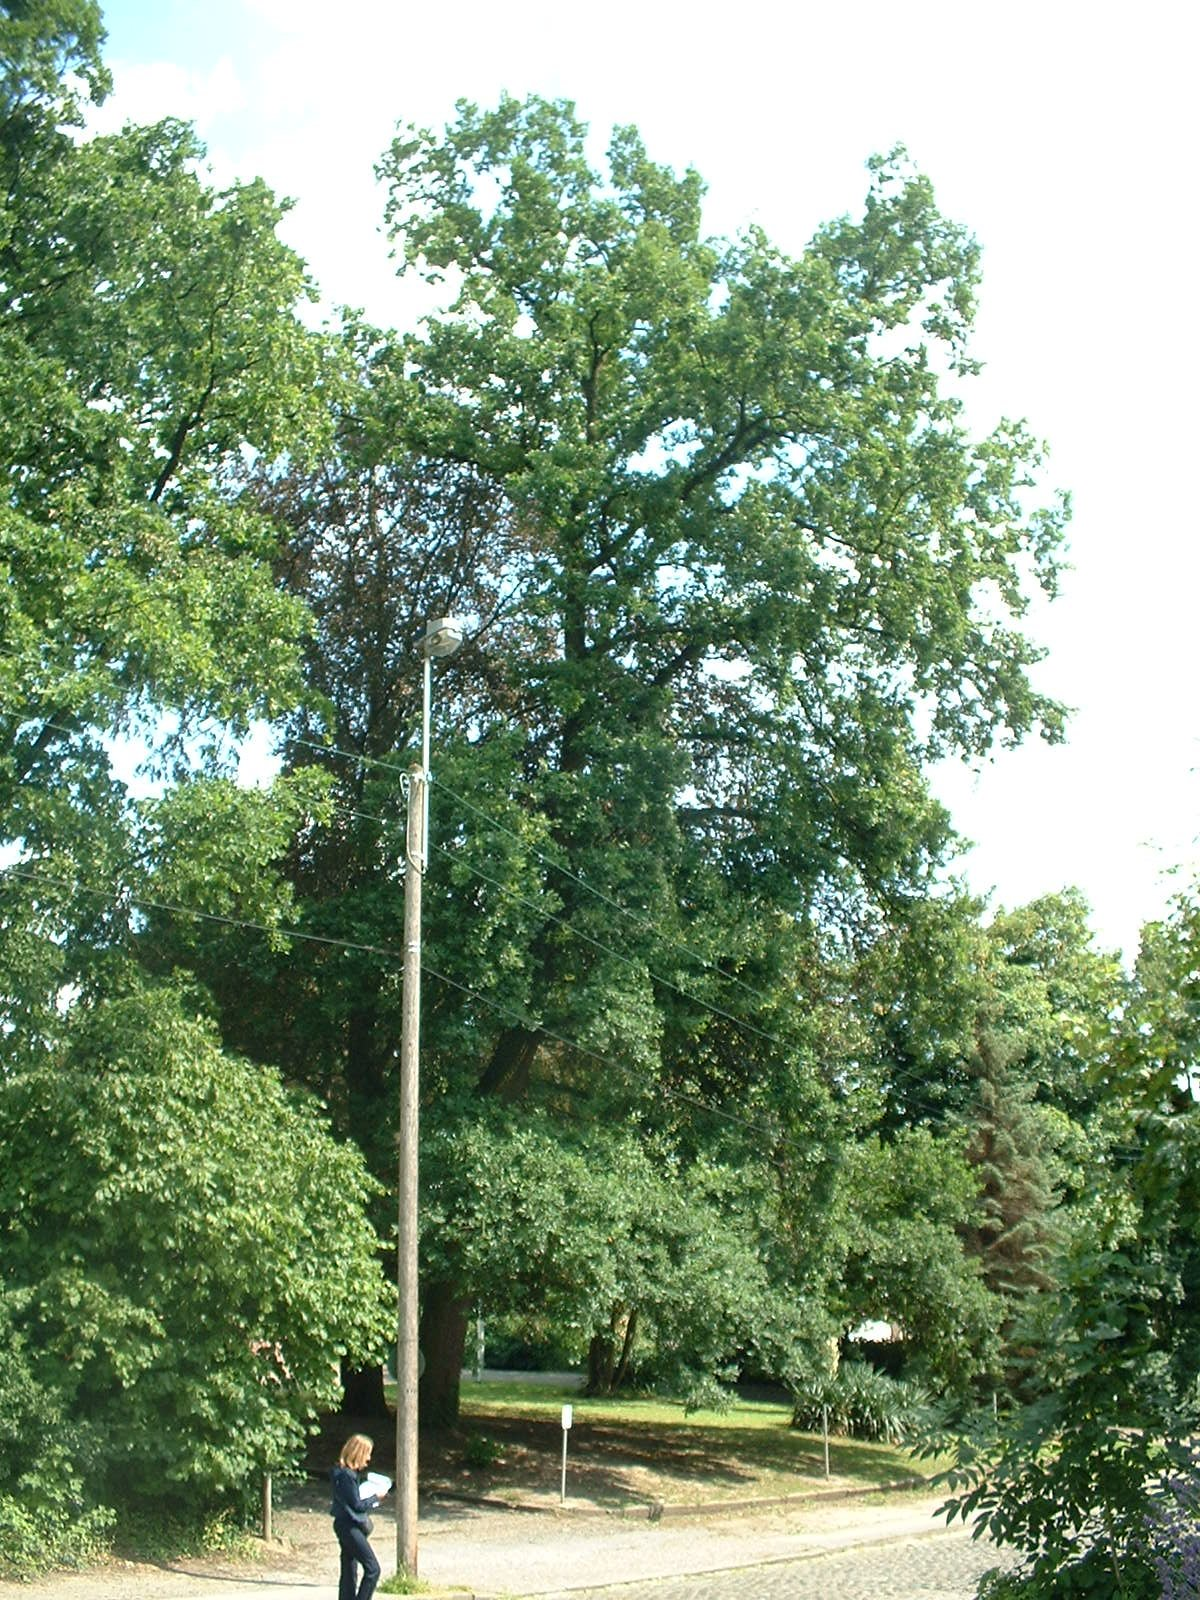 Chêne pédonculé – Molenbeek-Saint-Jean, Rue Paloke, 77 –  06 Juillet 2004